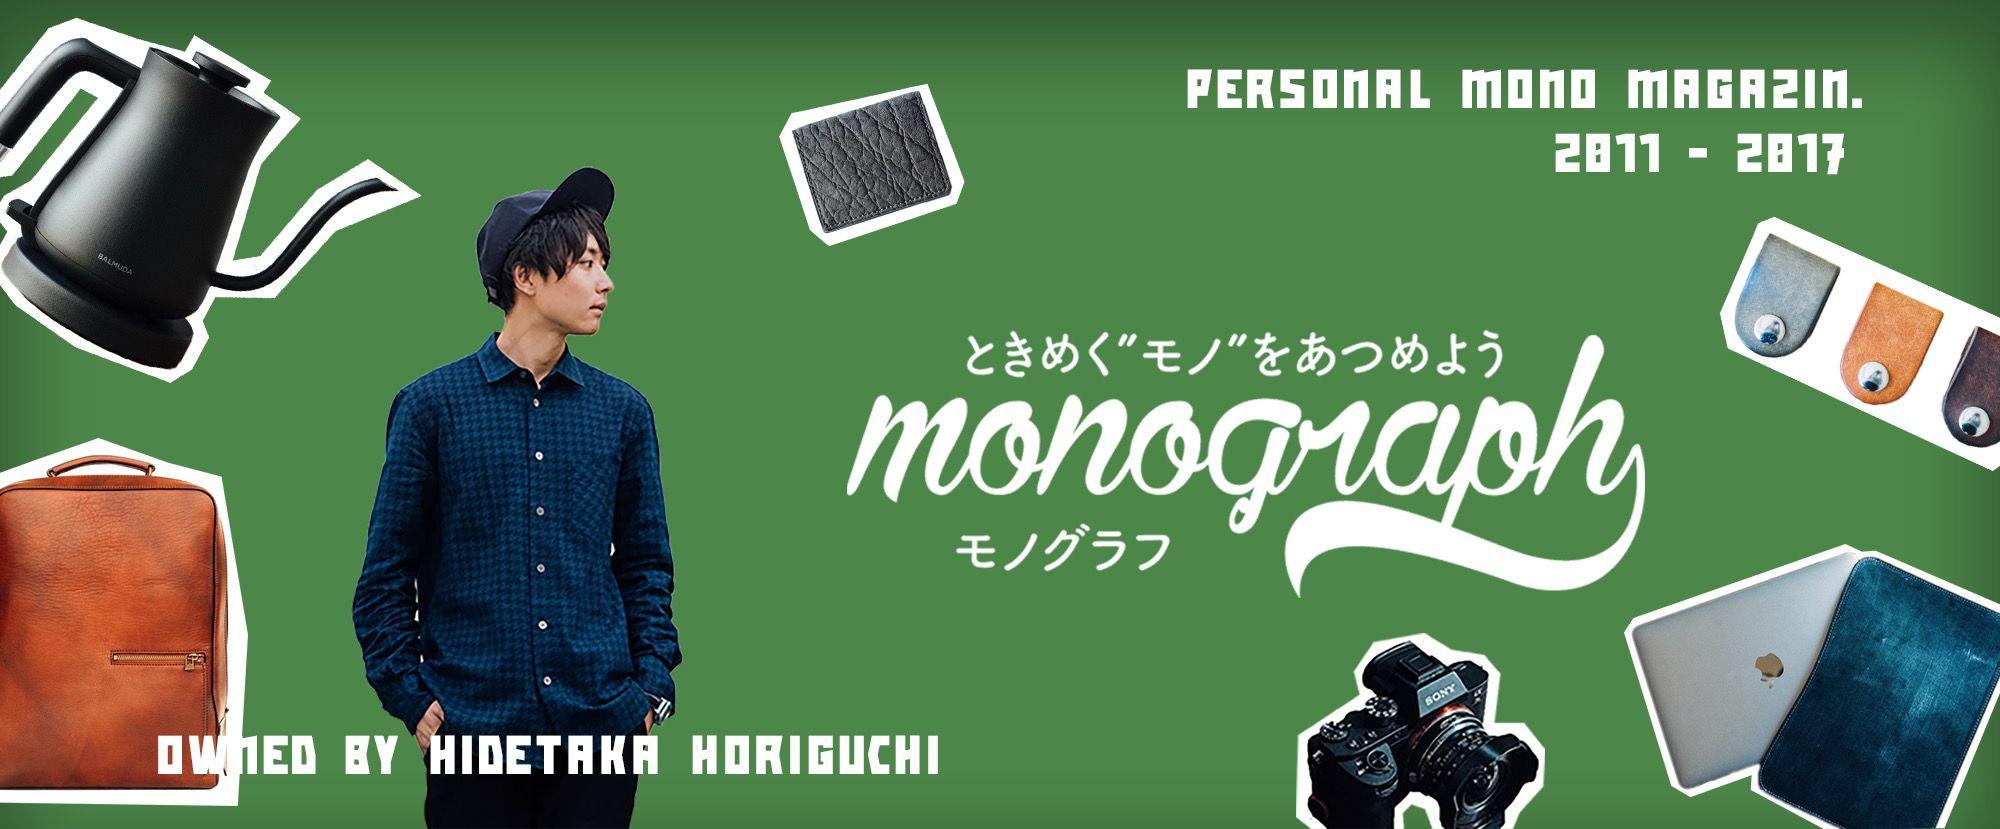 iPhome・Mac・ガジェットブログ「monograph」